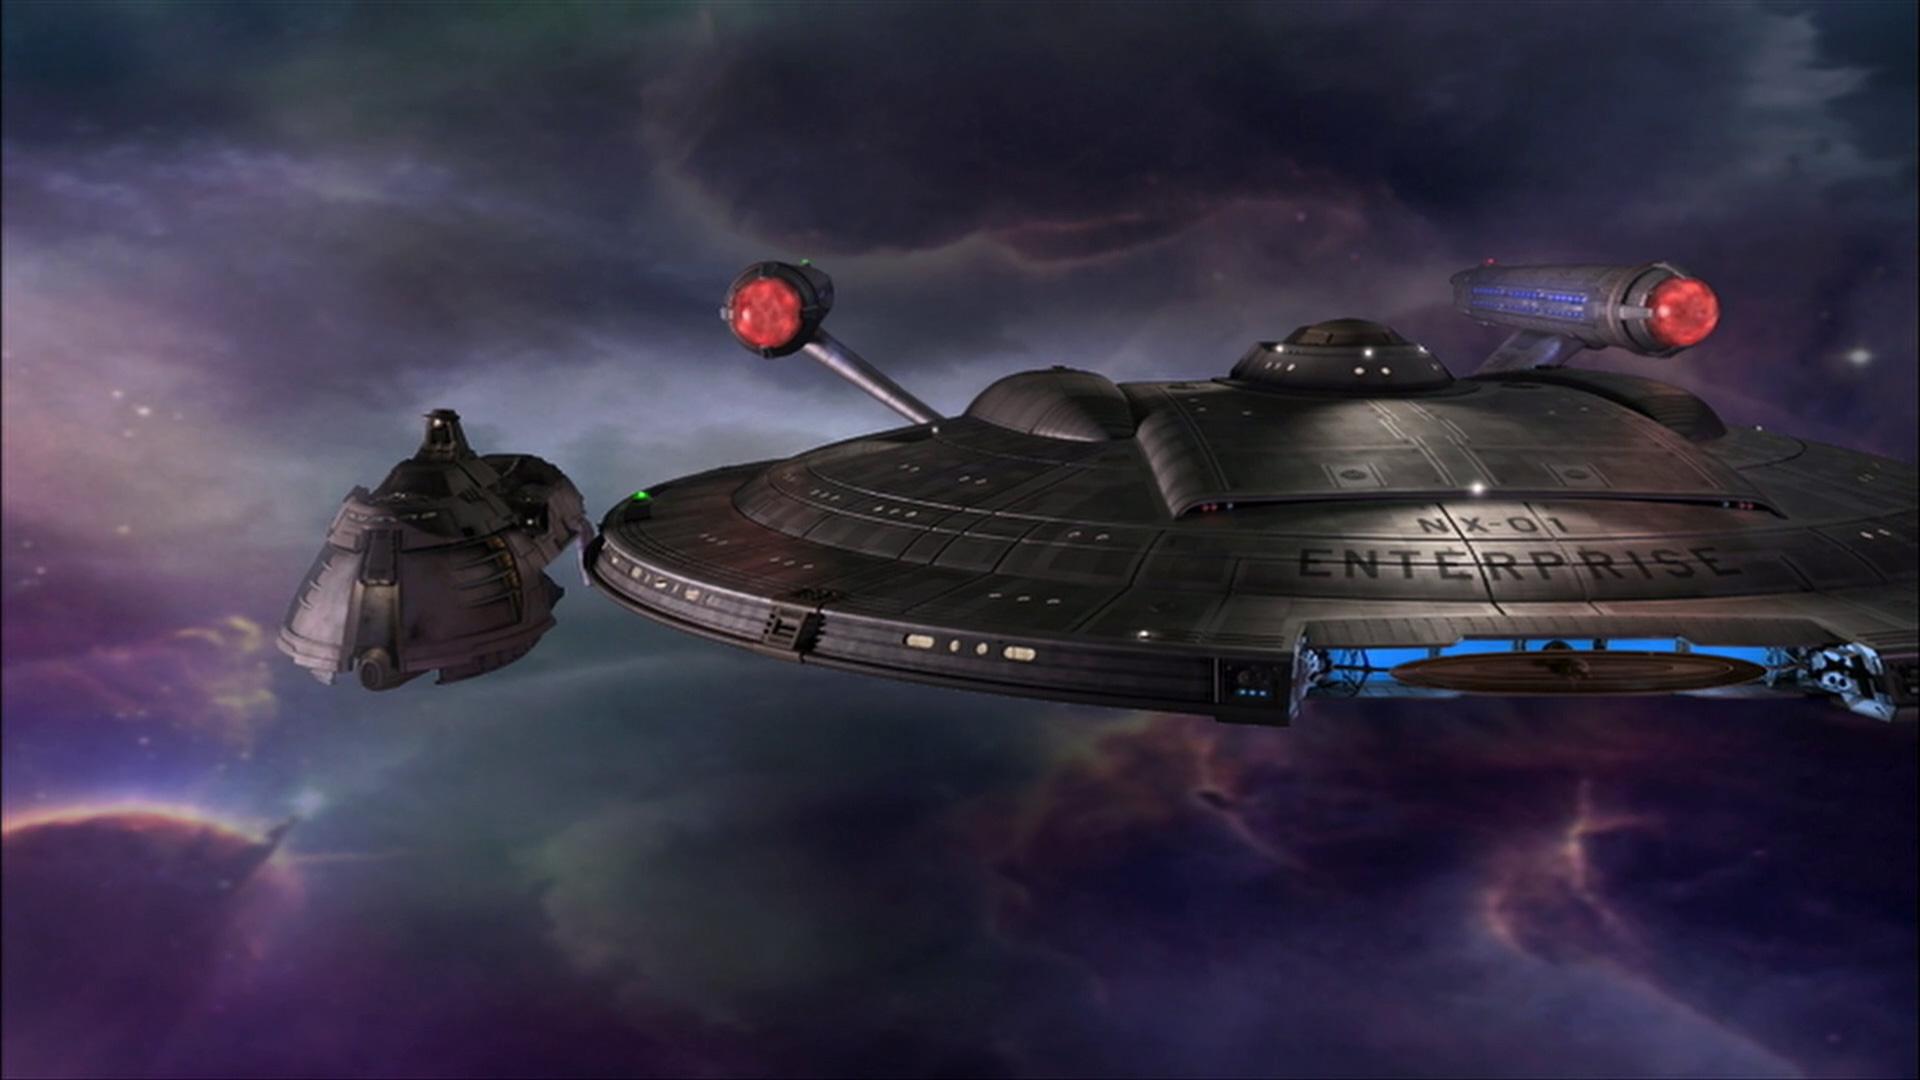 Star Trek: Enterprise Wallpapers, Pictures, Images